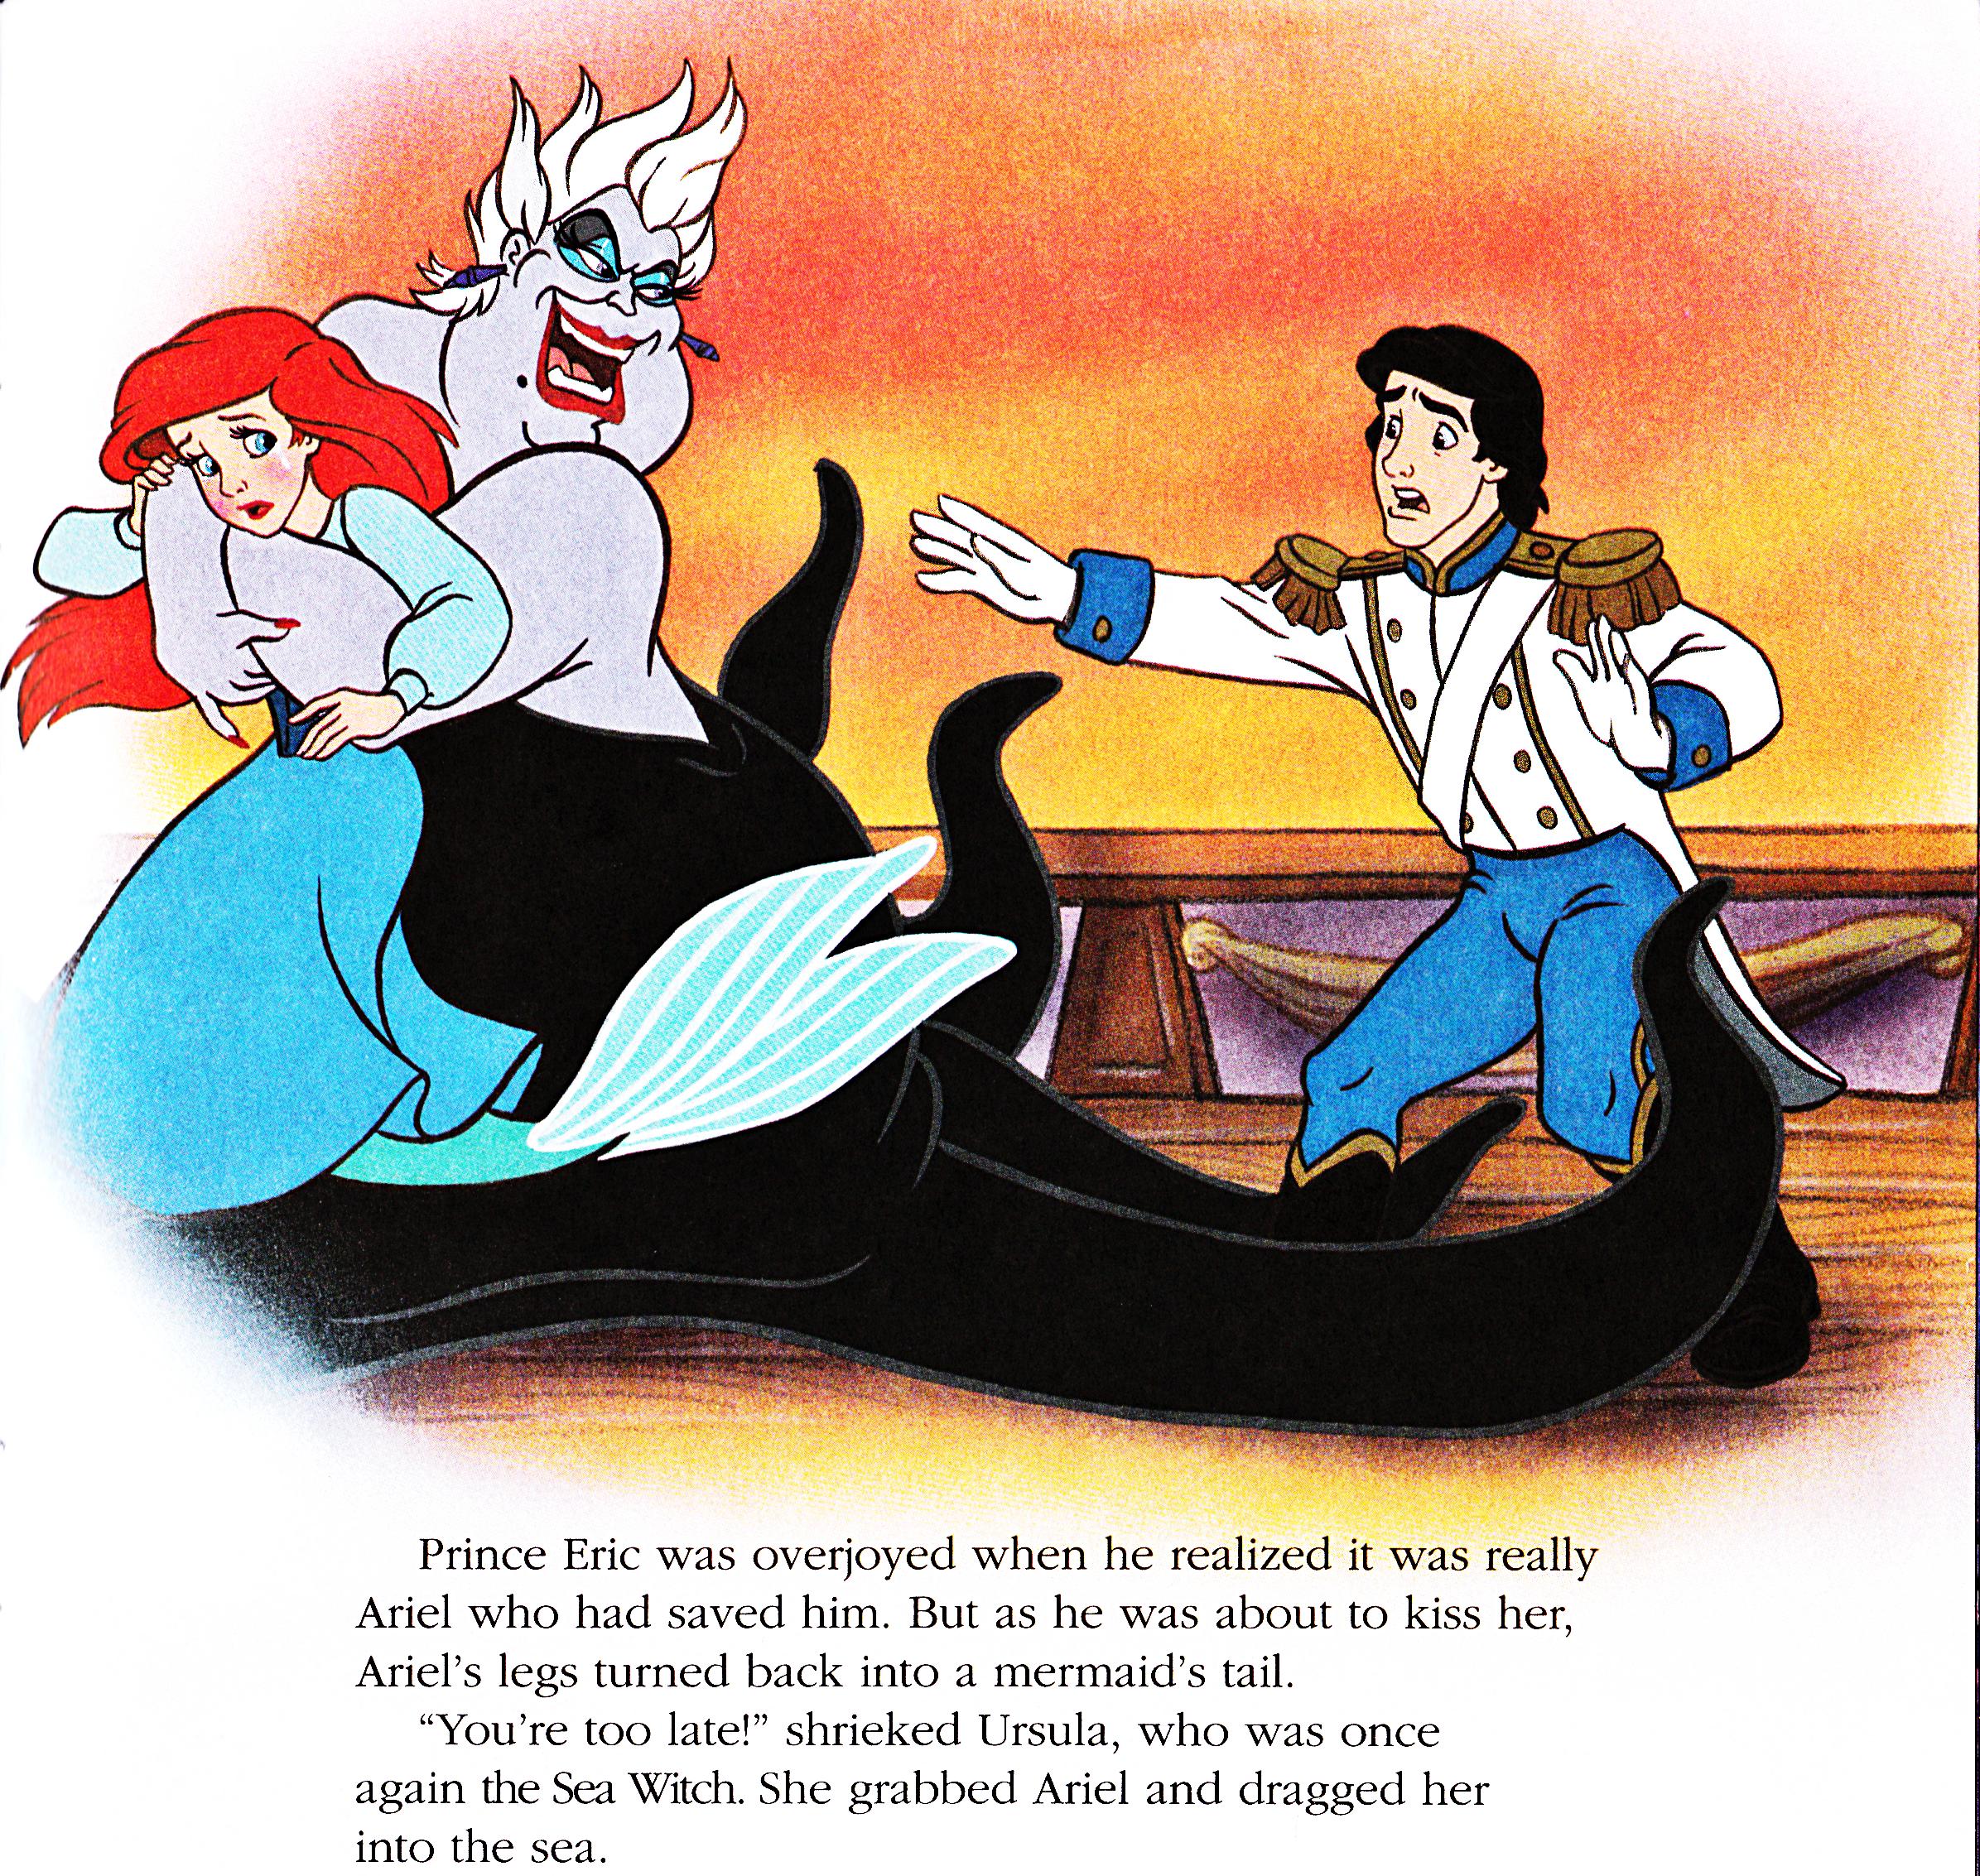 Walt Disney Book immagini - Princess Ariel, Ursula & Prince Eric